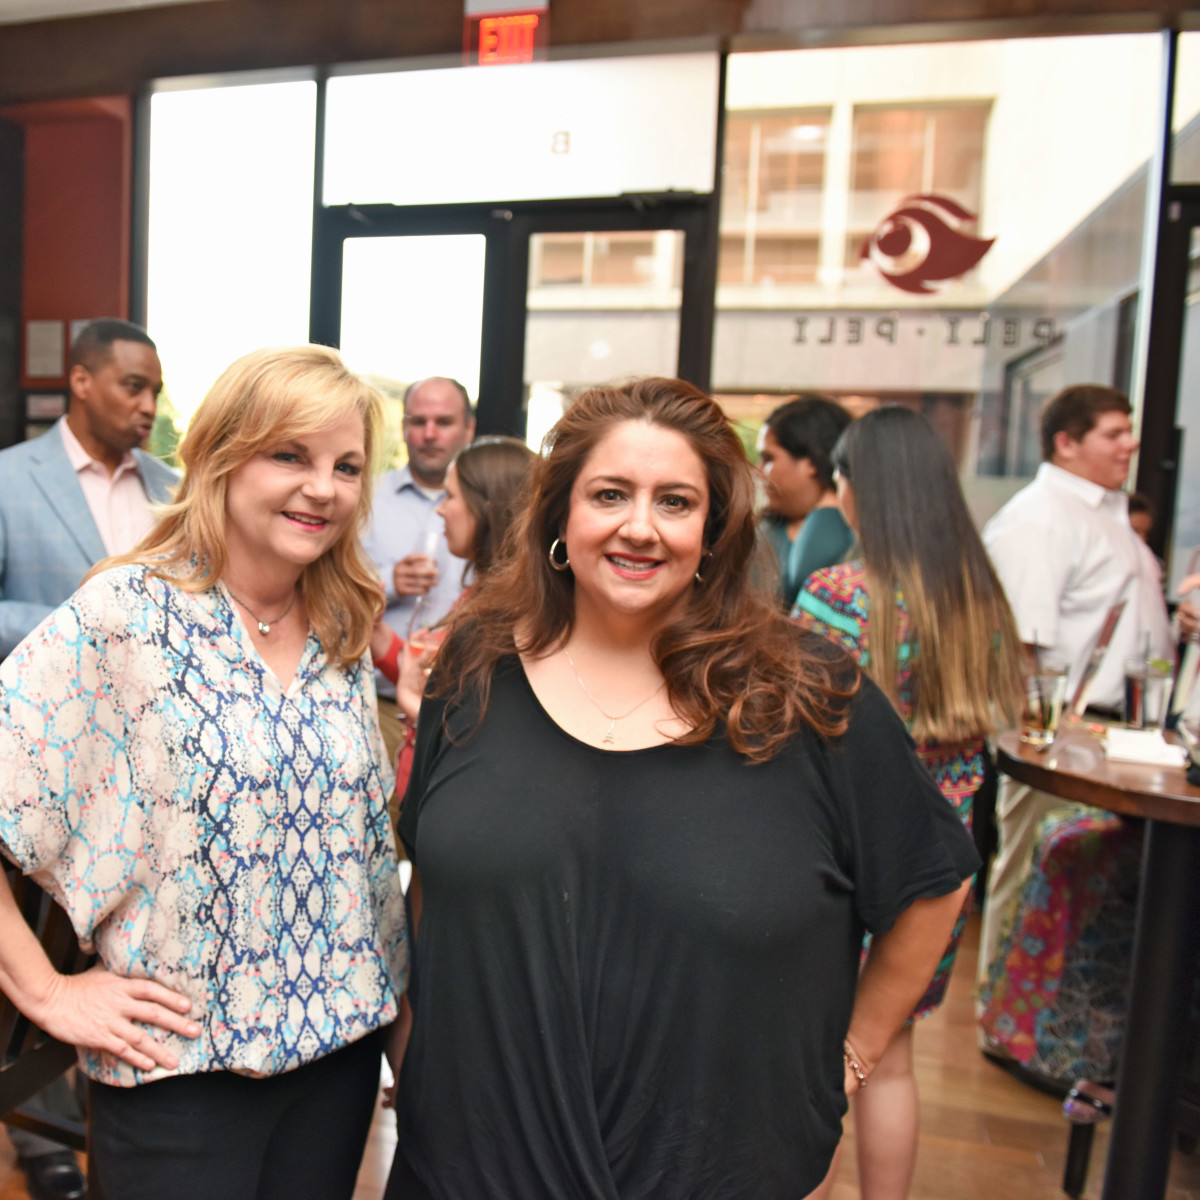 Houston, George Springer Bowling Benefit Kick Off, June 2015, Kim Padgett, Sonia Soto